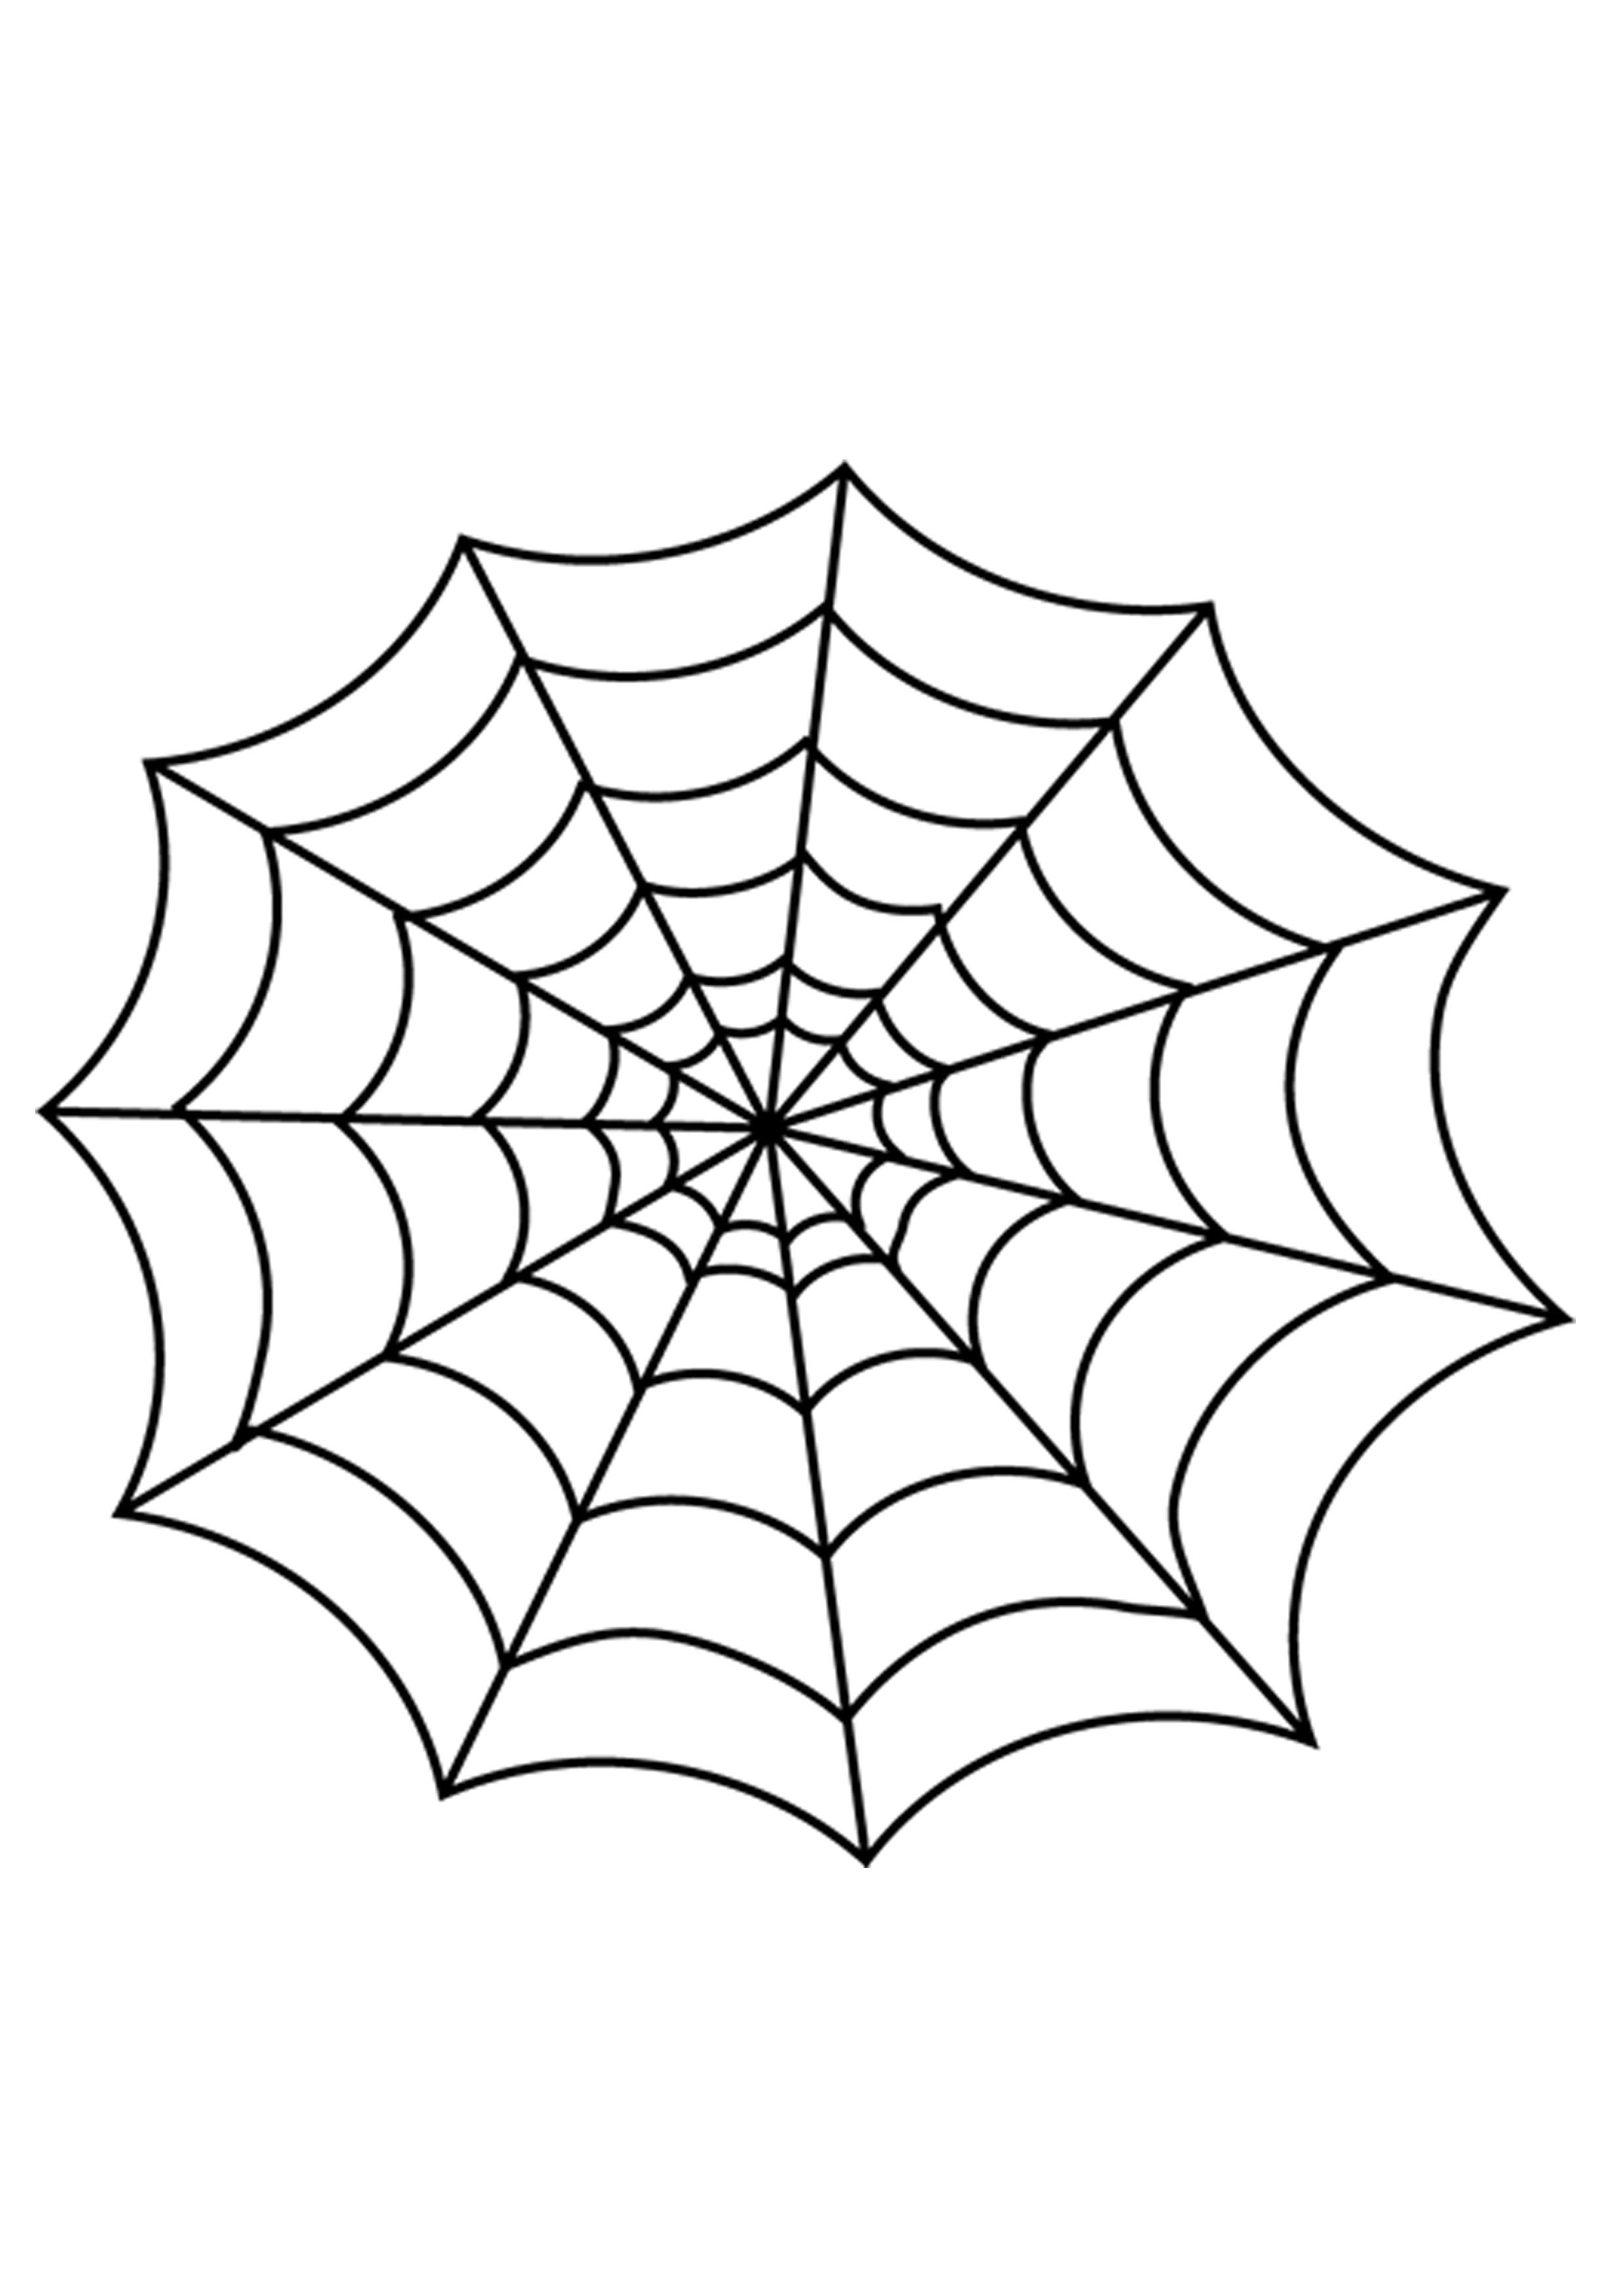 How To Make Glitter Glue Spider Web Halloween Decorations - Spider Web Stencil Free Printable